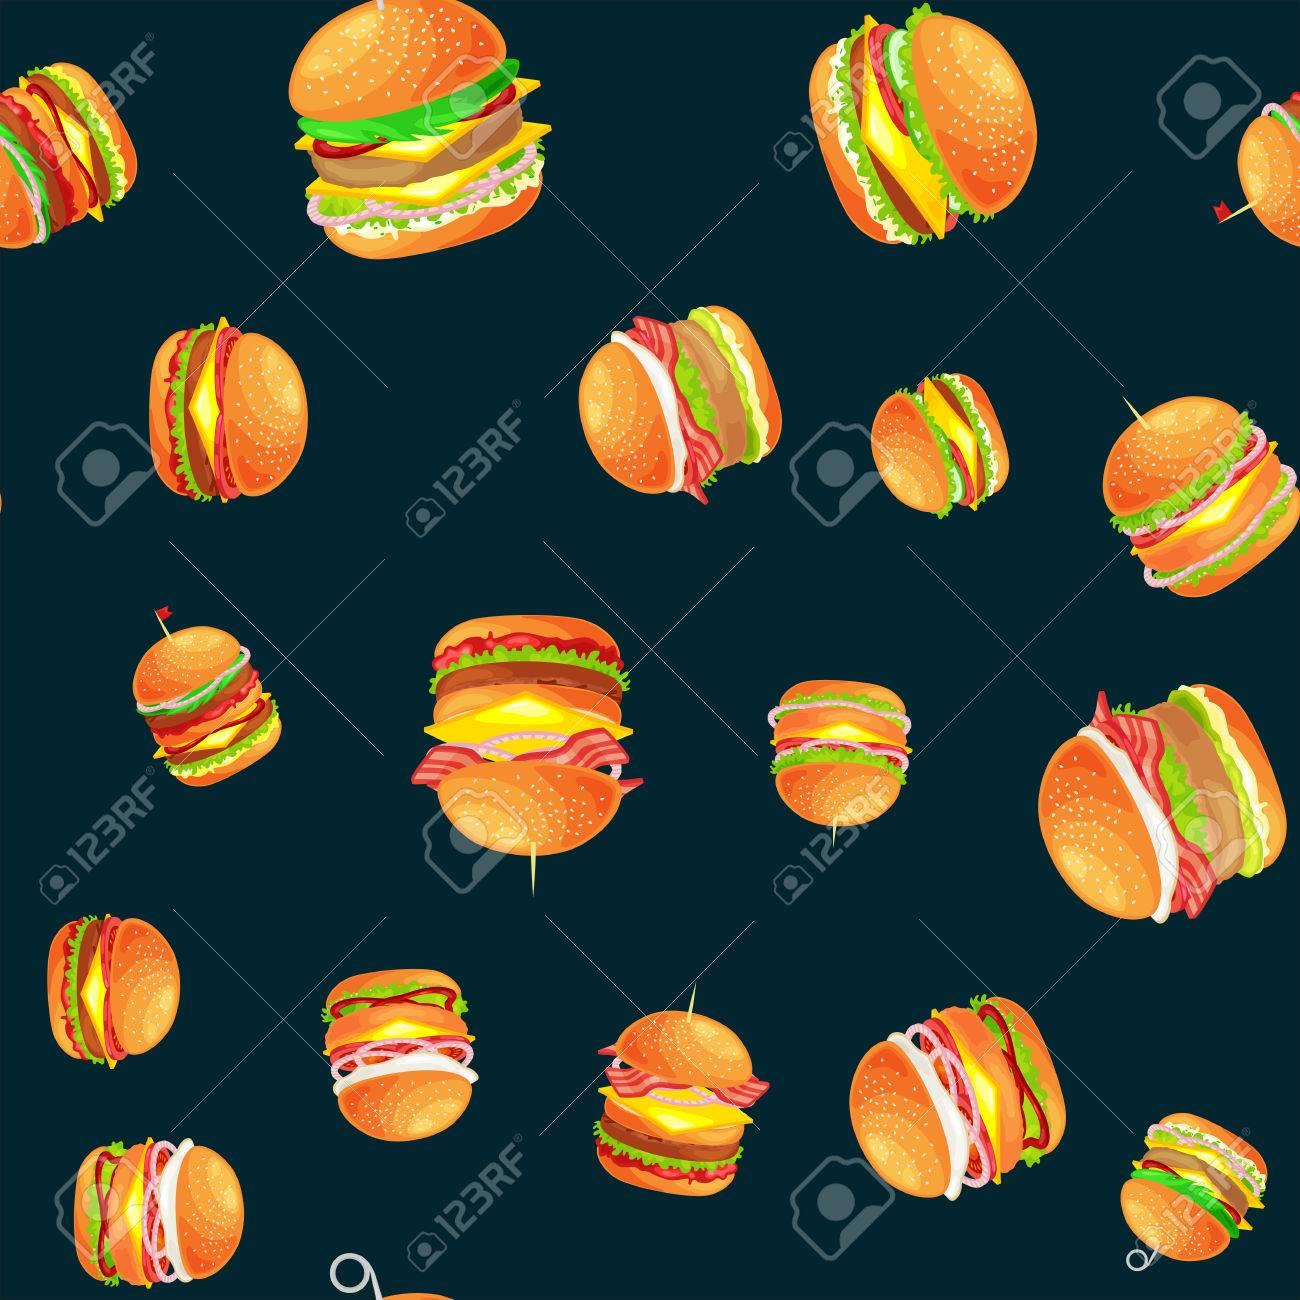 american hamburger, fast food meal menu barbecue meat vector